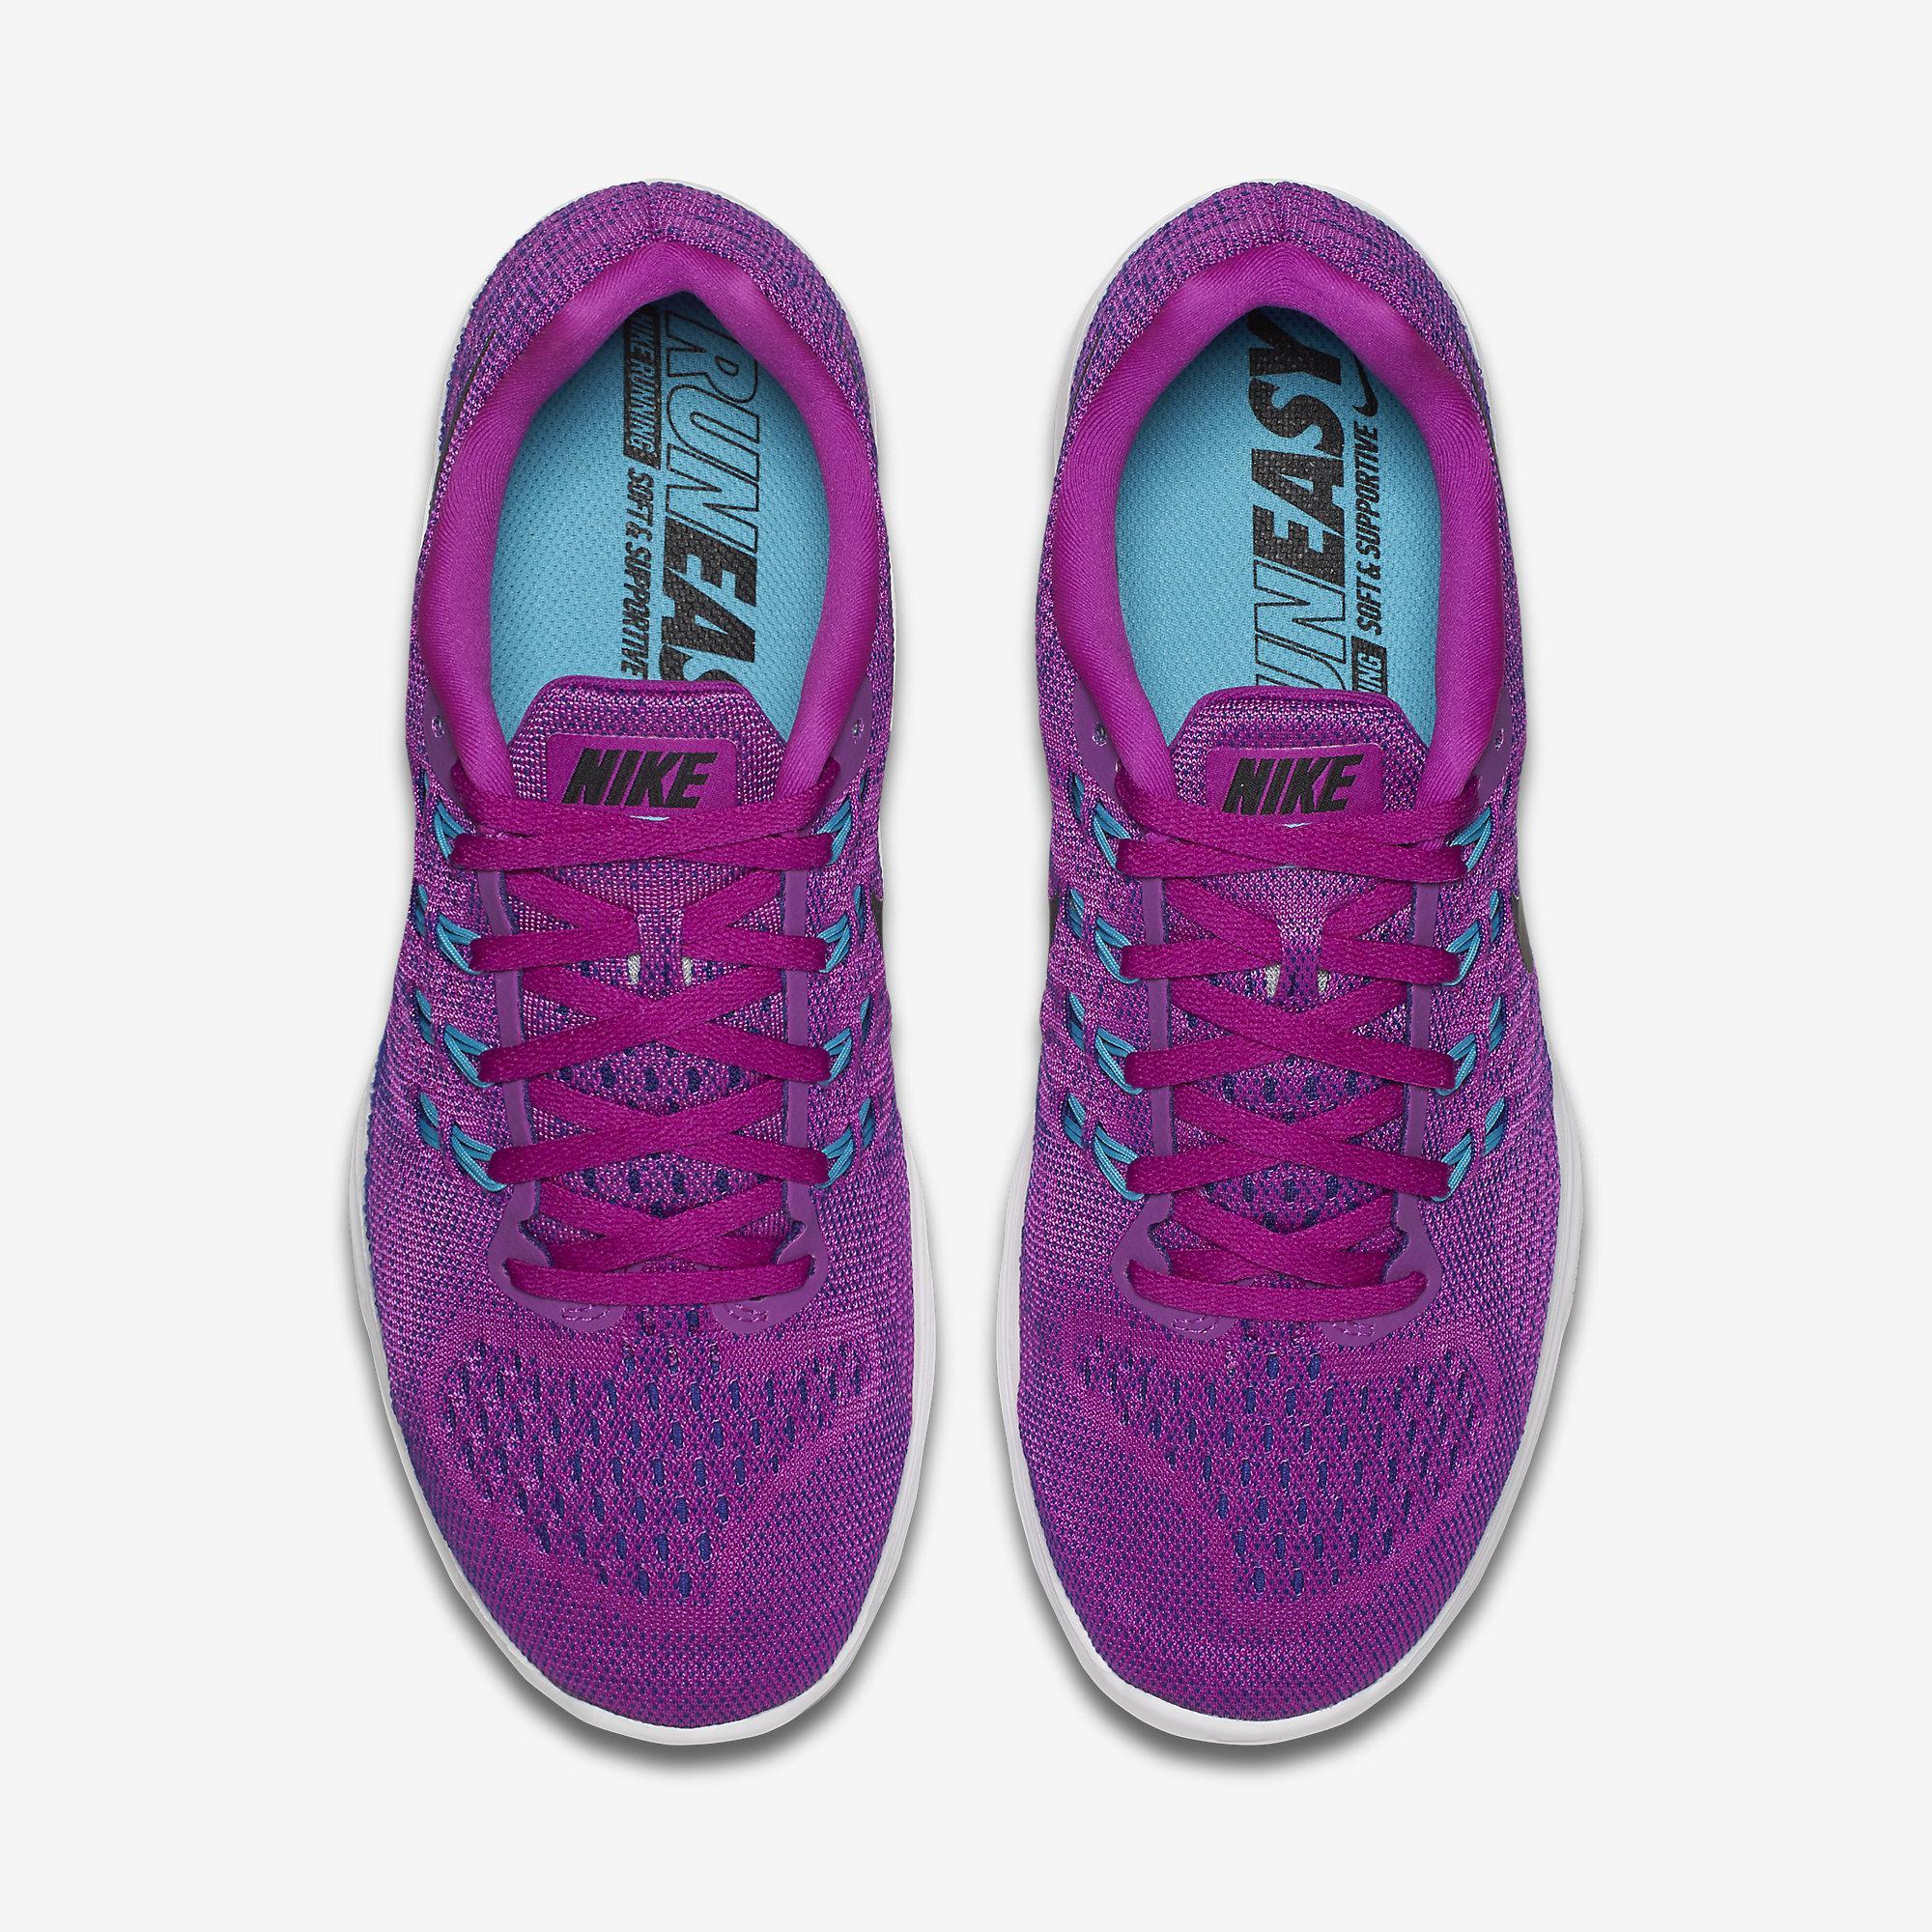 nike homme 5.0 noir blanc - Nike Womens LunarTempo 2 Running Shoes - Hyper Violet - Tennisnuts.com